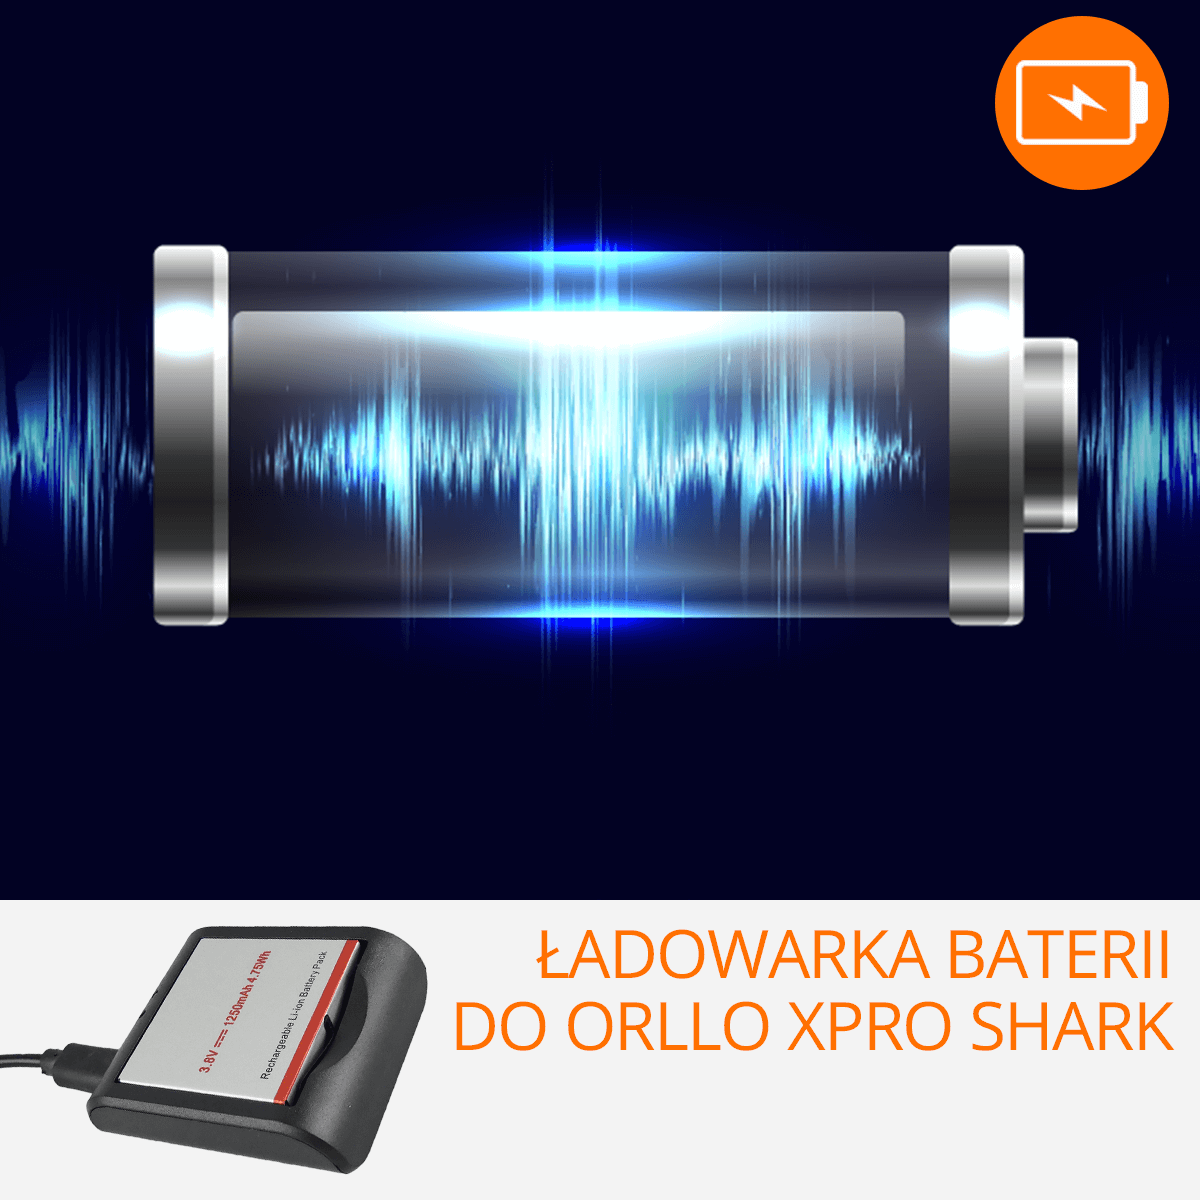 ladowarka-baterii-do-orllo-xpro-shark